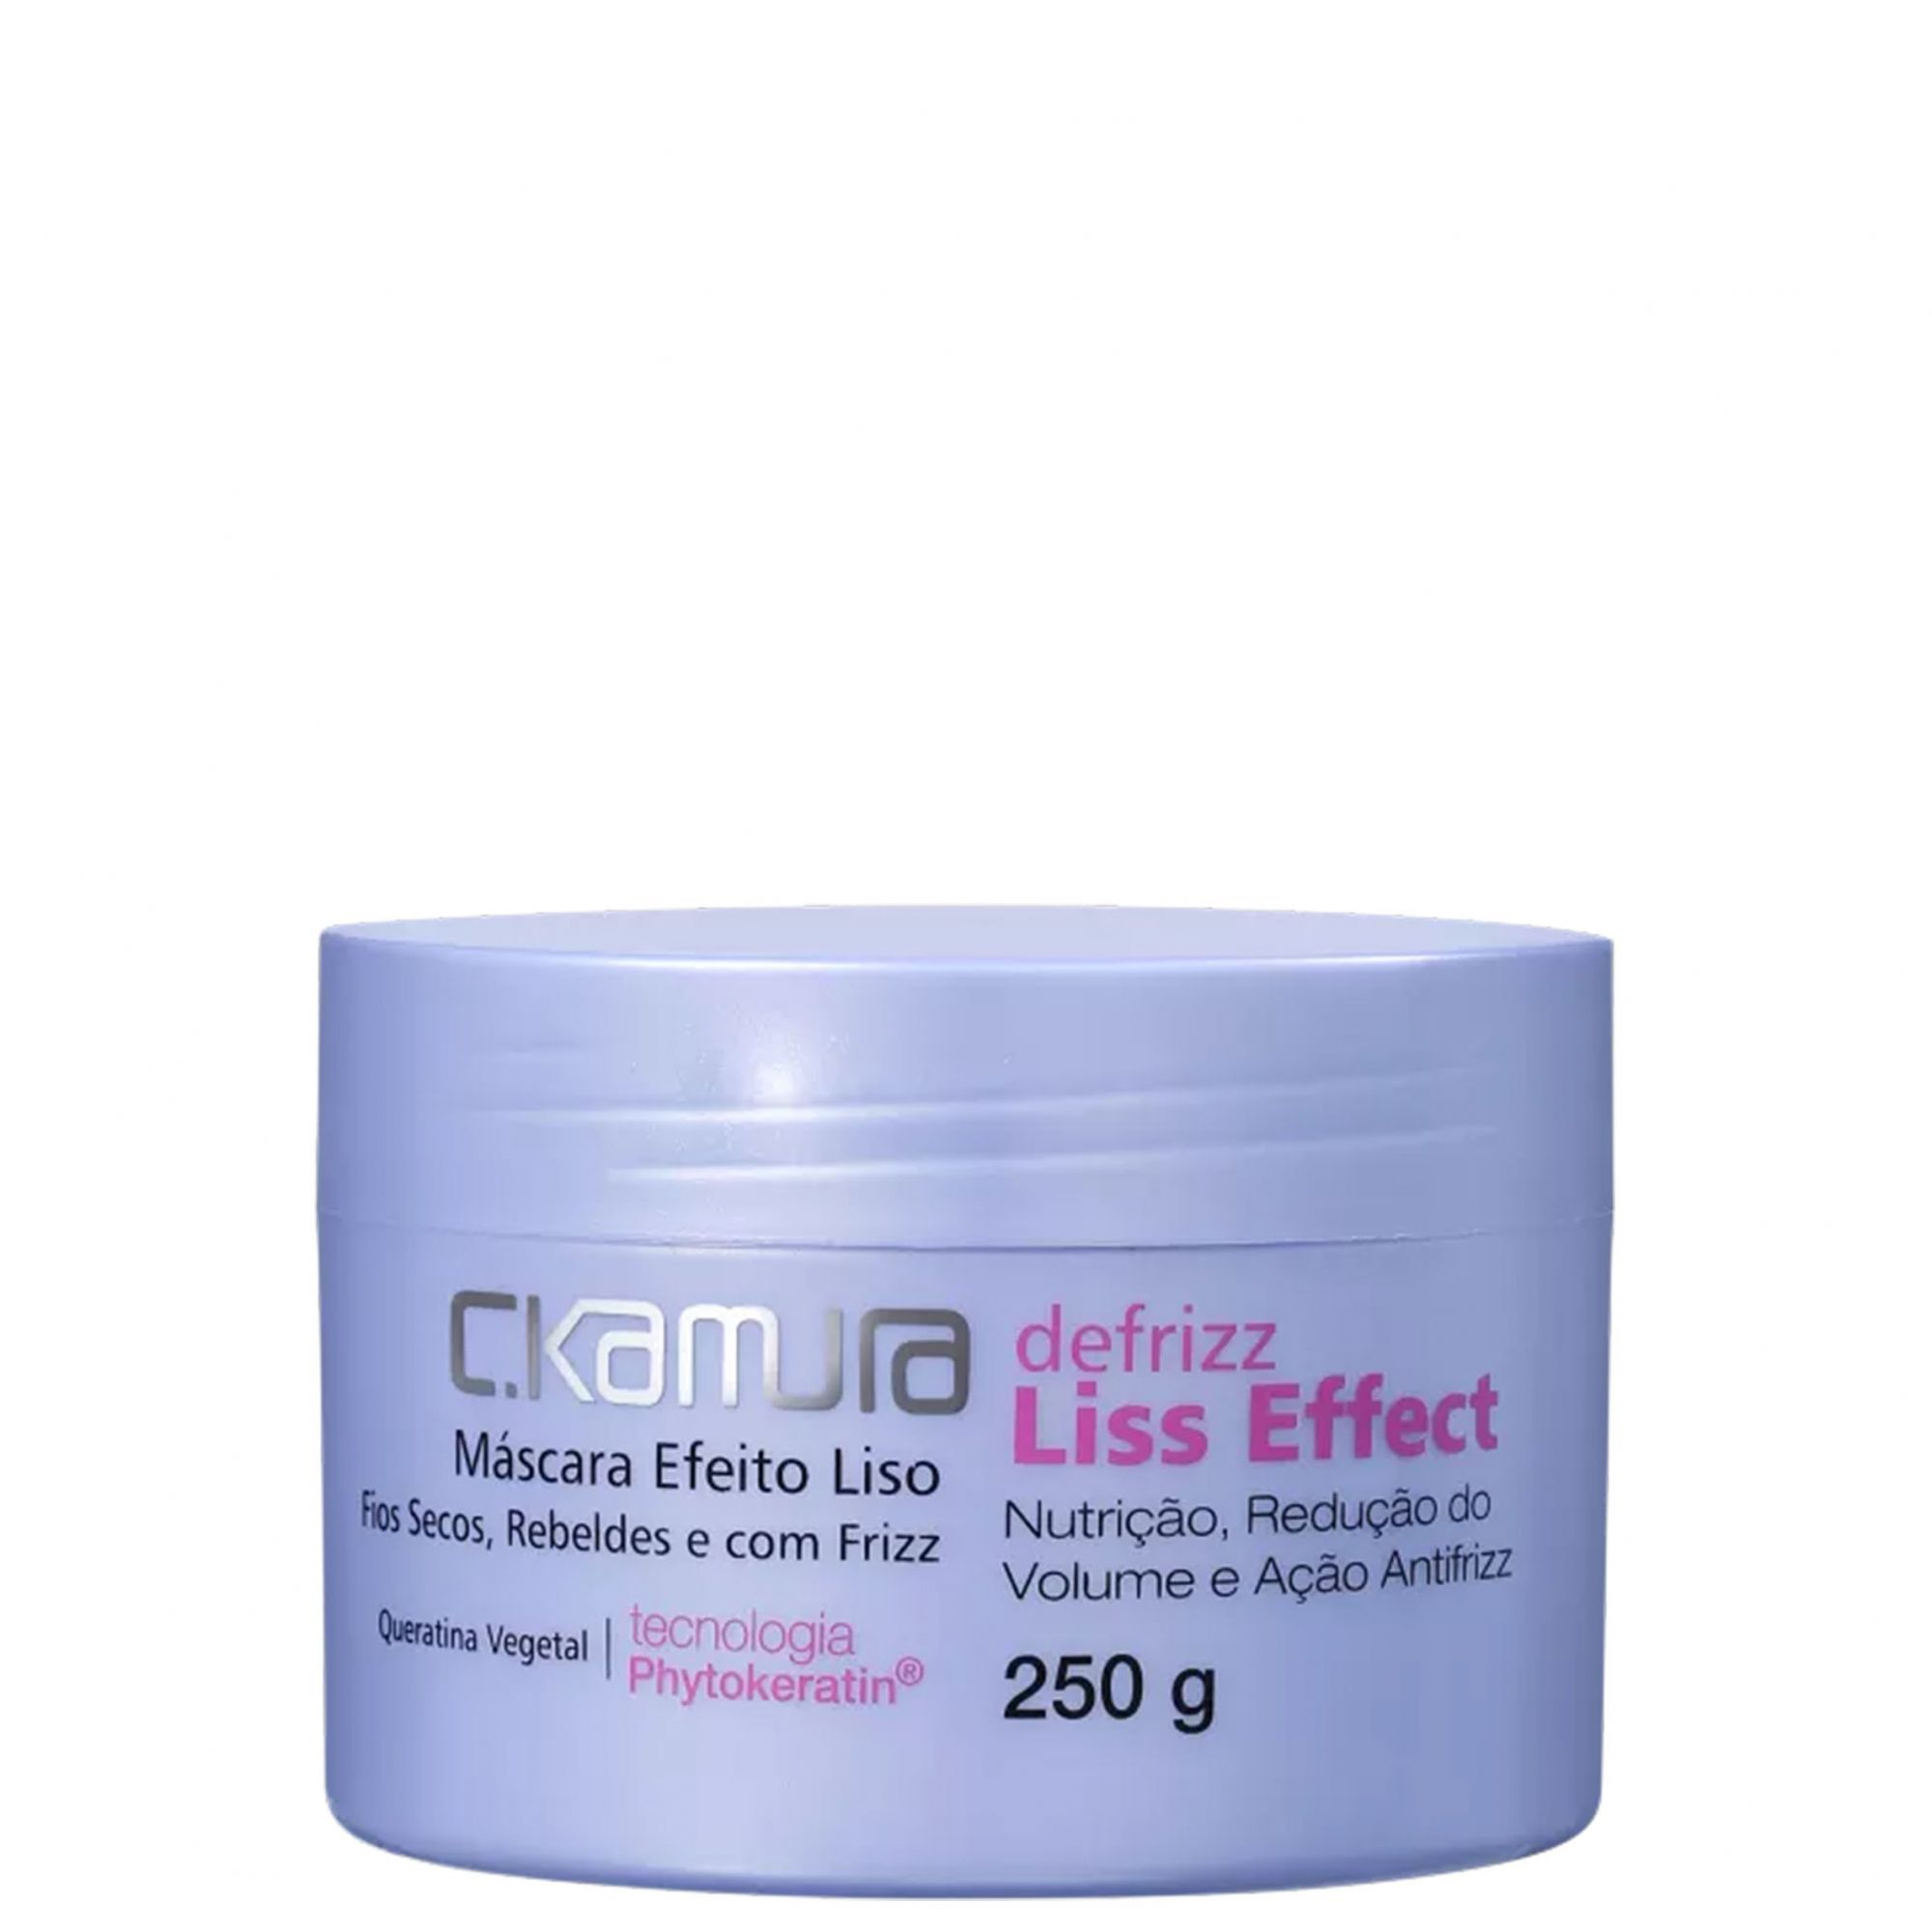 C.Kamura Defrizz Liss Effect Máscara Capilar 250g.